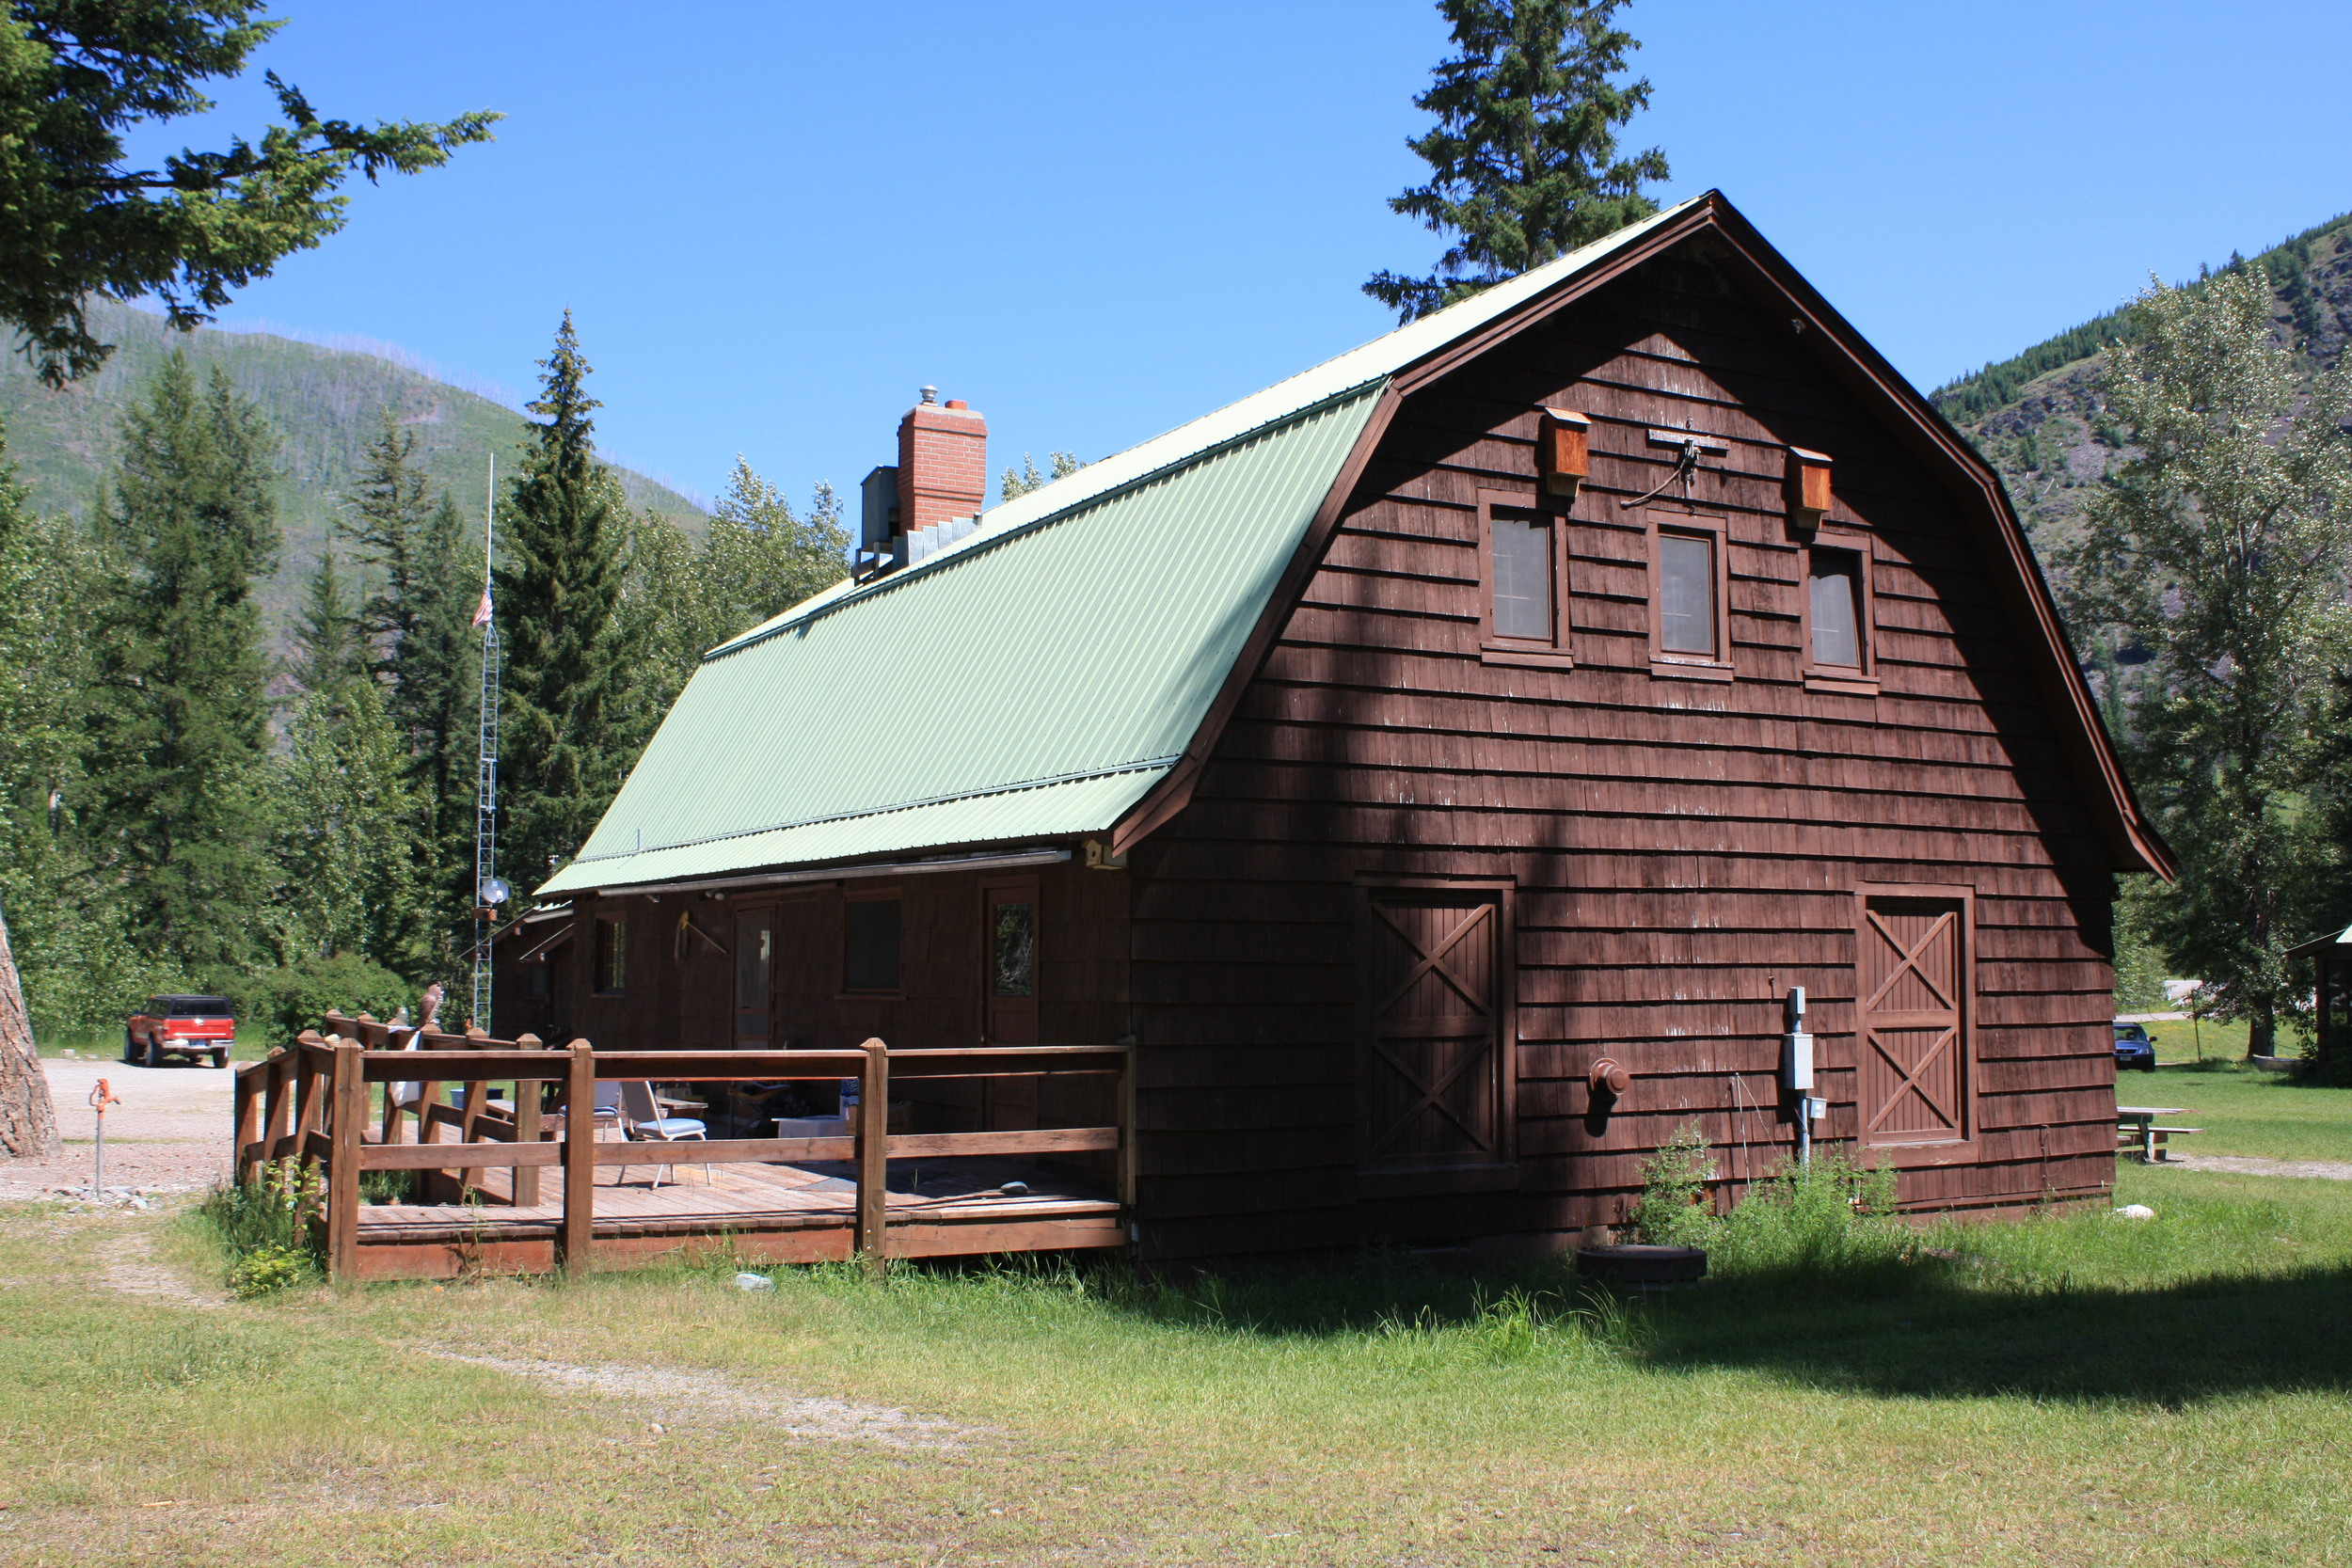 Big Creek Ranger Station